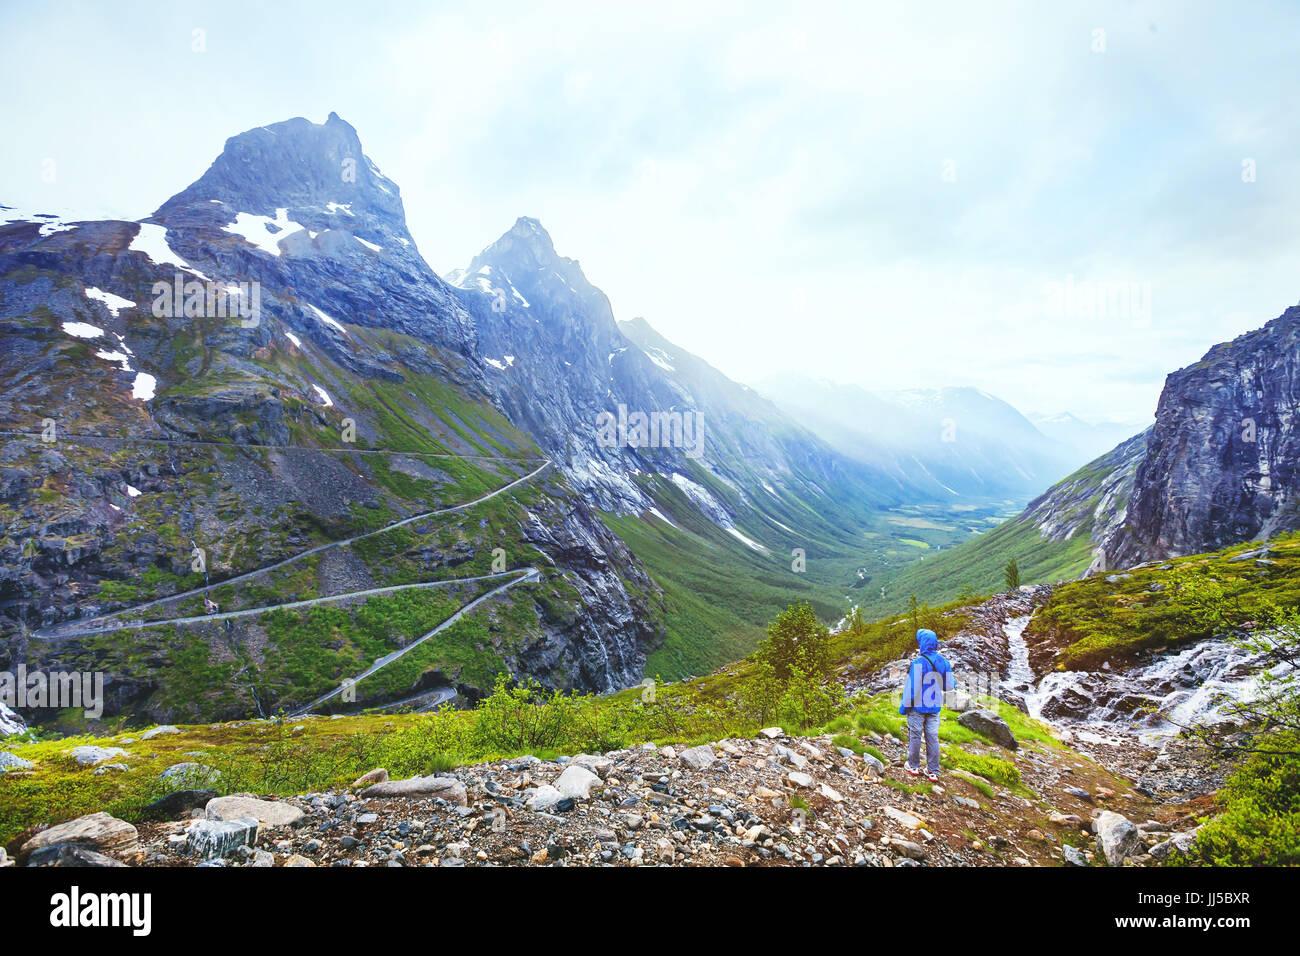 Trollstigen in Norway, tourist looking at mountain road in stunning beautiful landscape - Stock Image